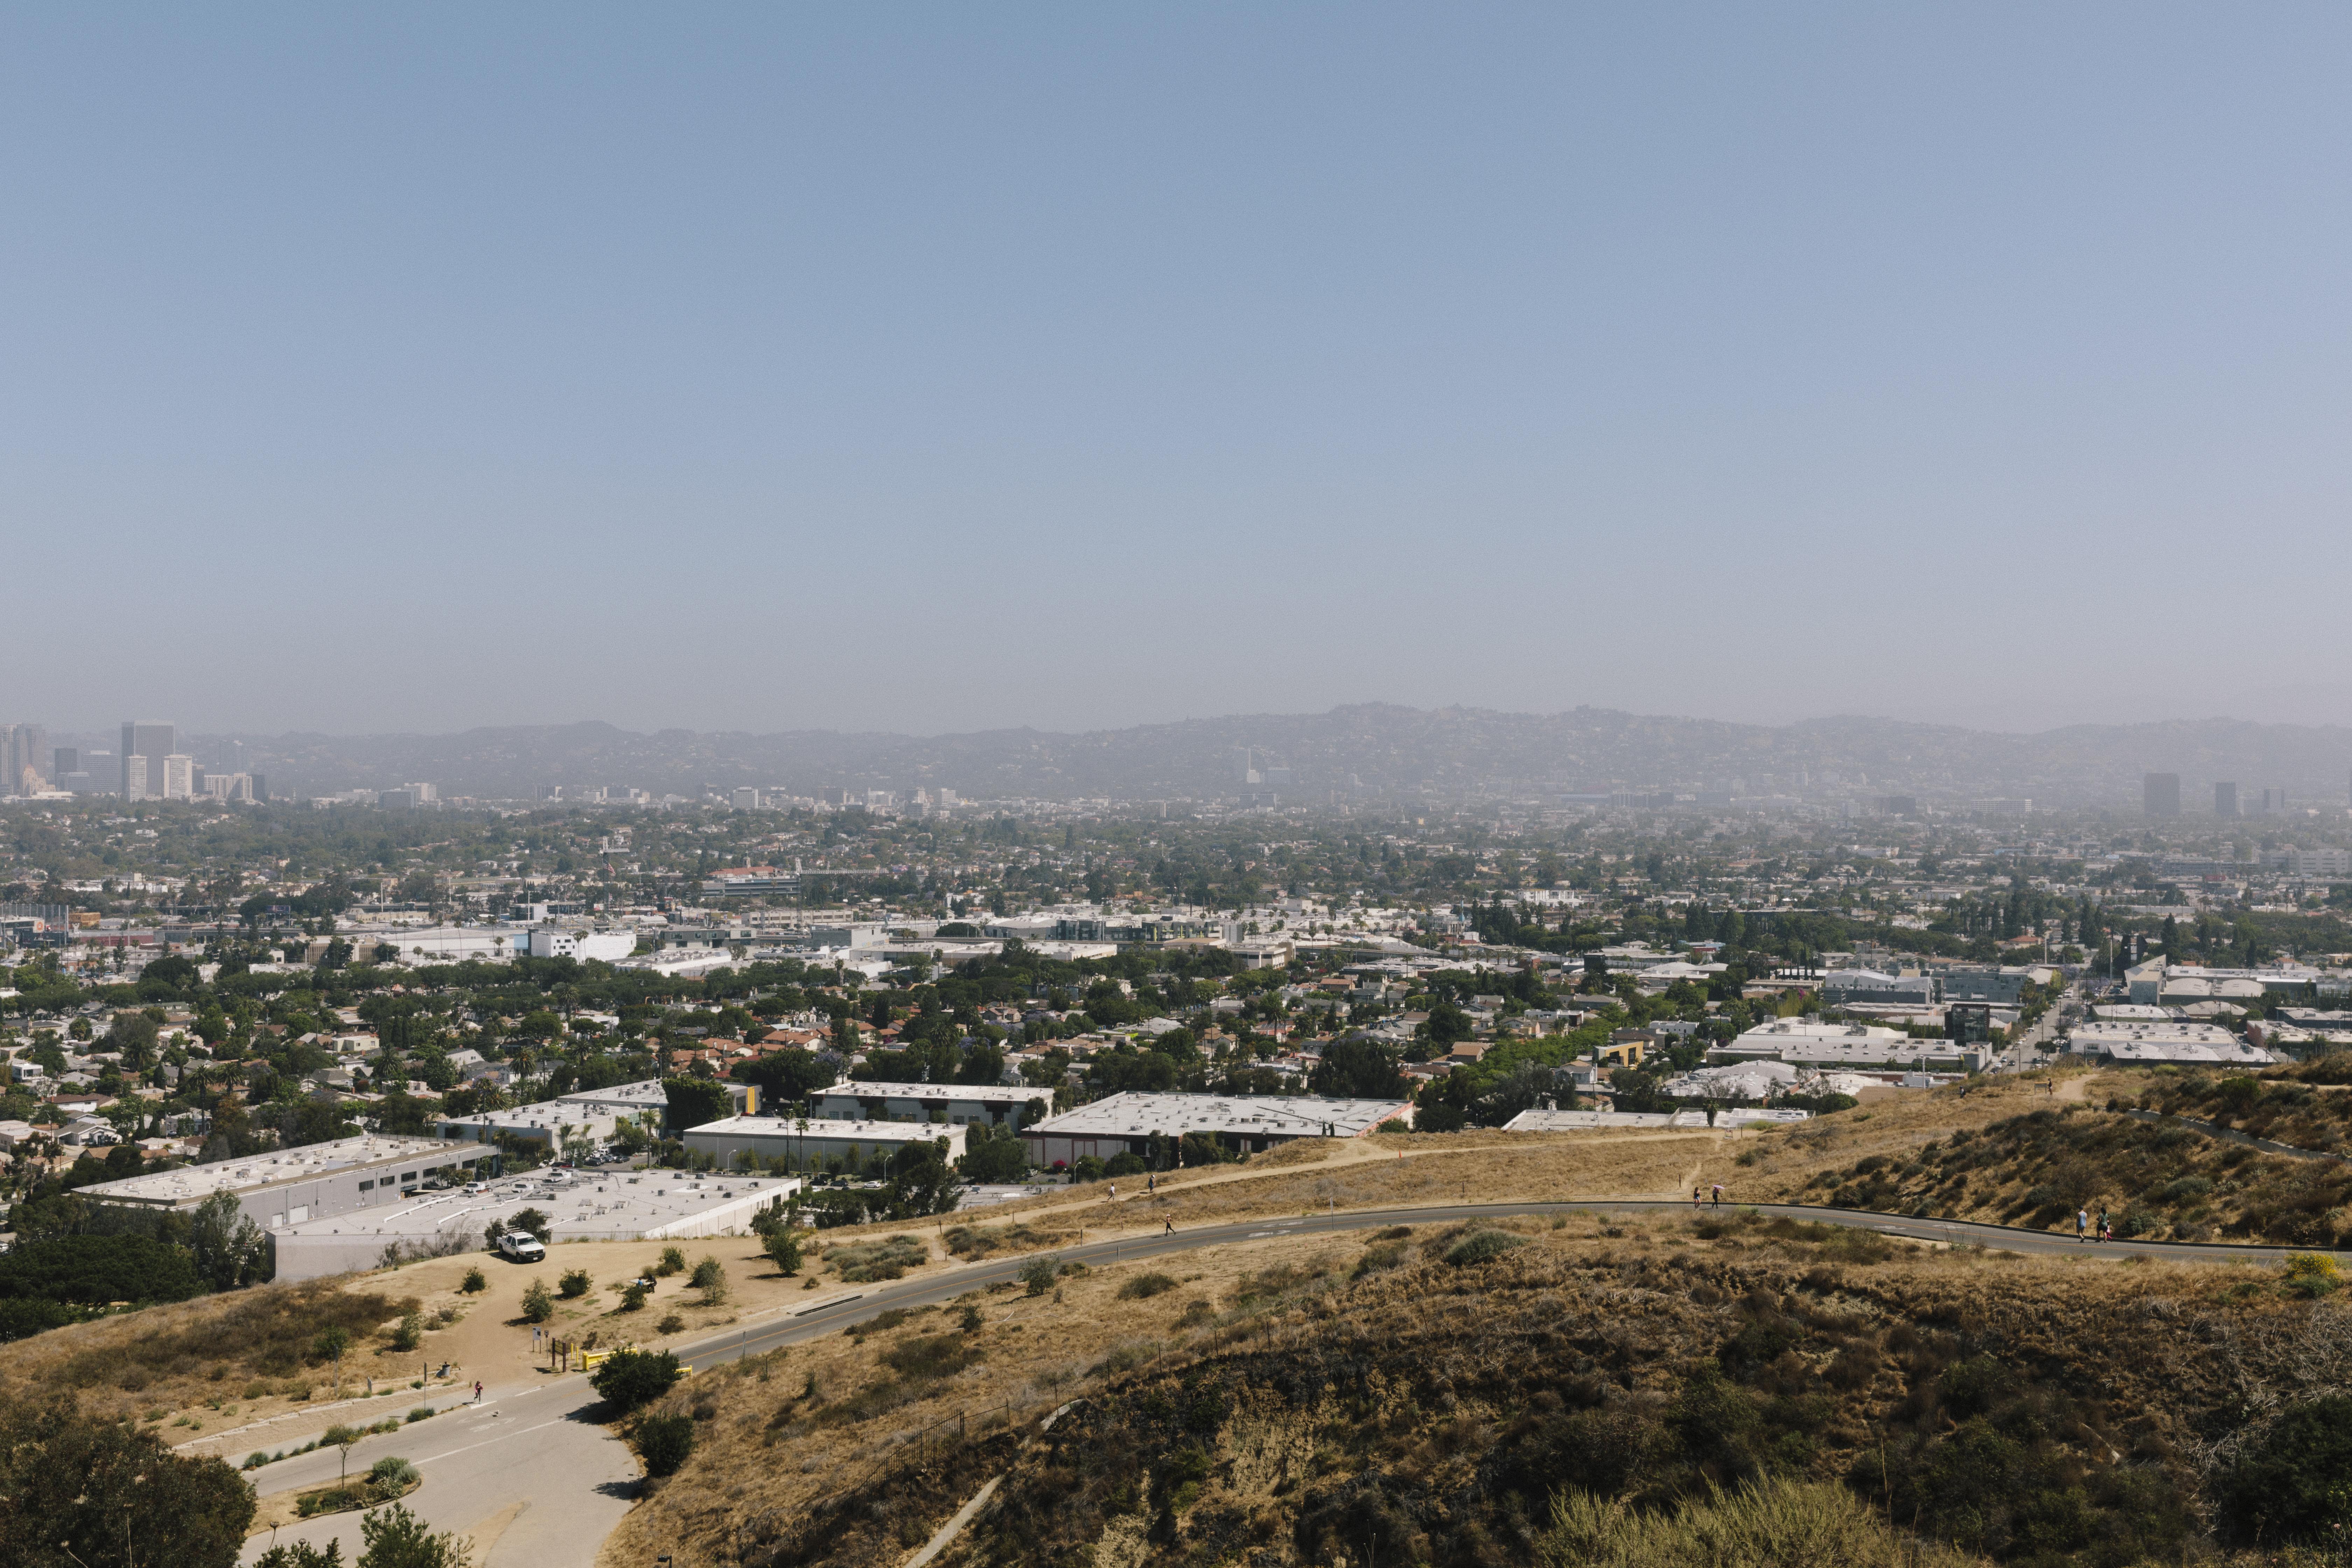 View into San Fernando Valley